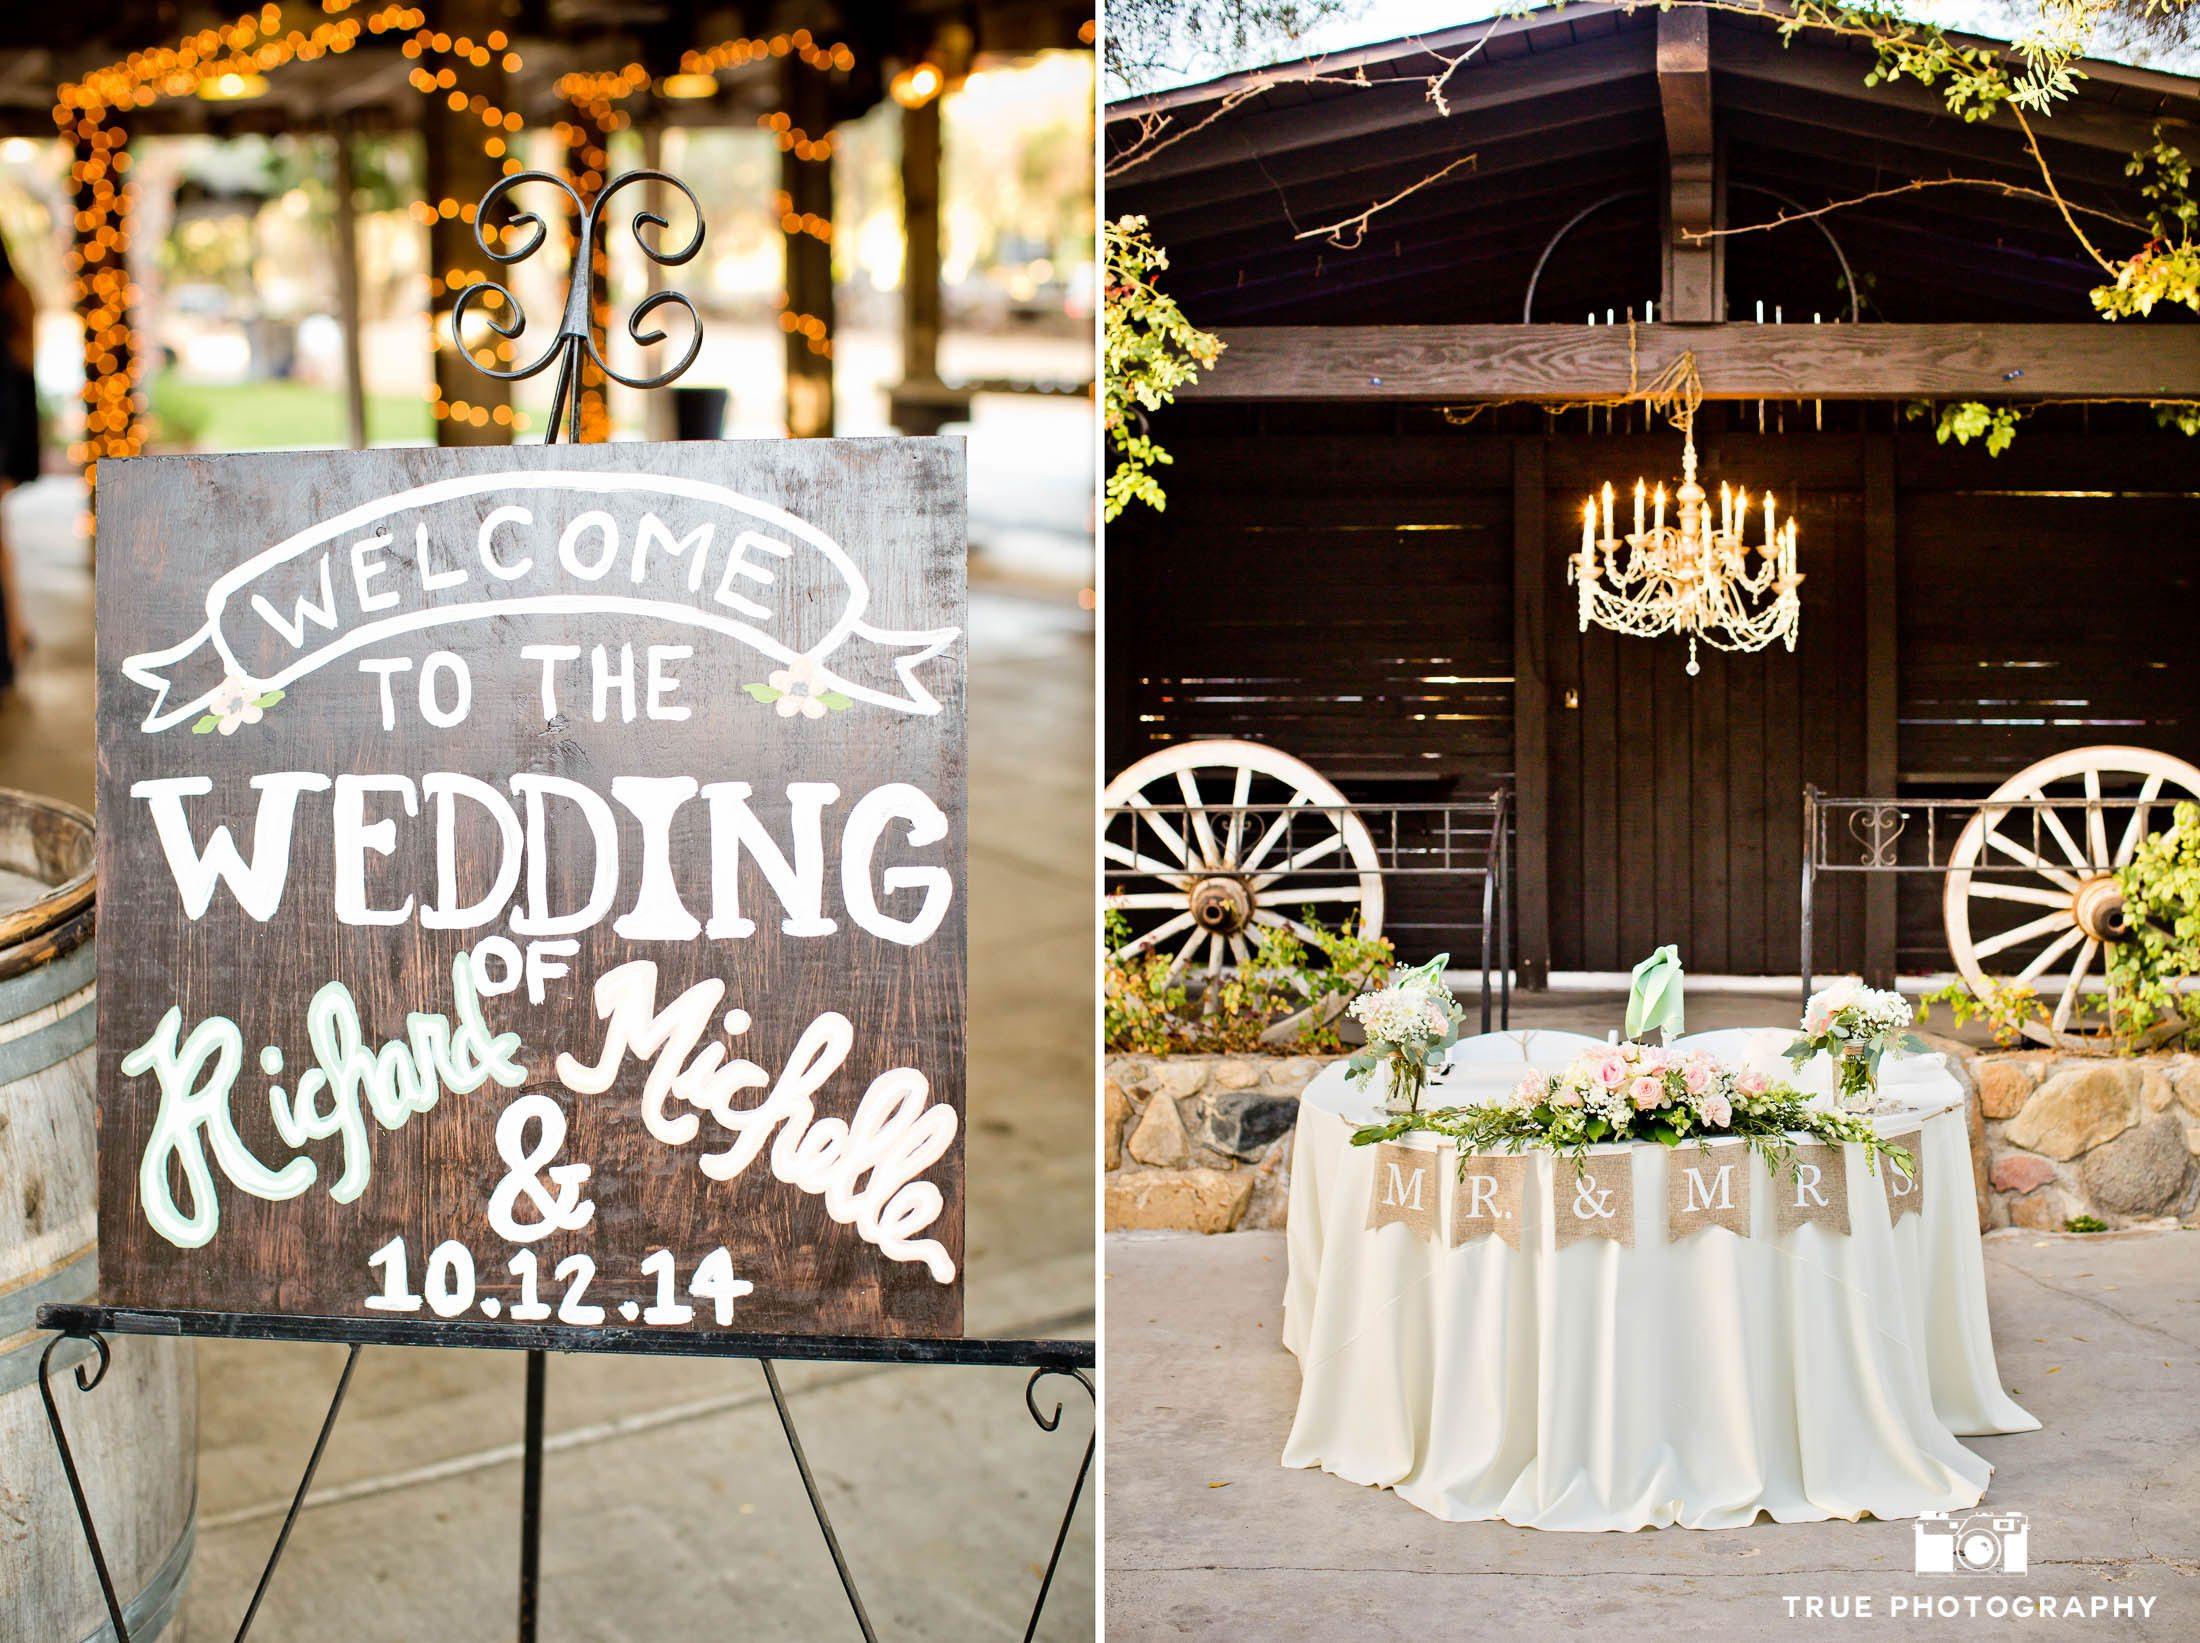 Rustic-themed details at vineyard wedding reception